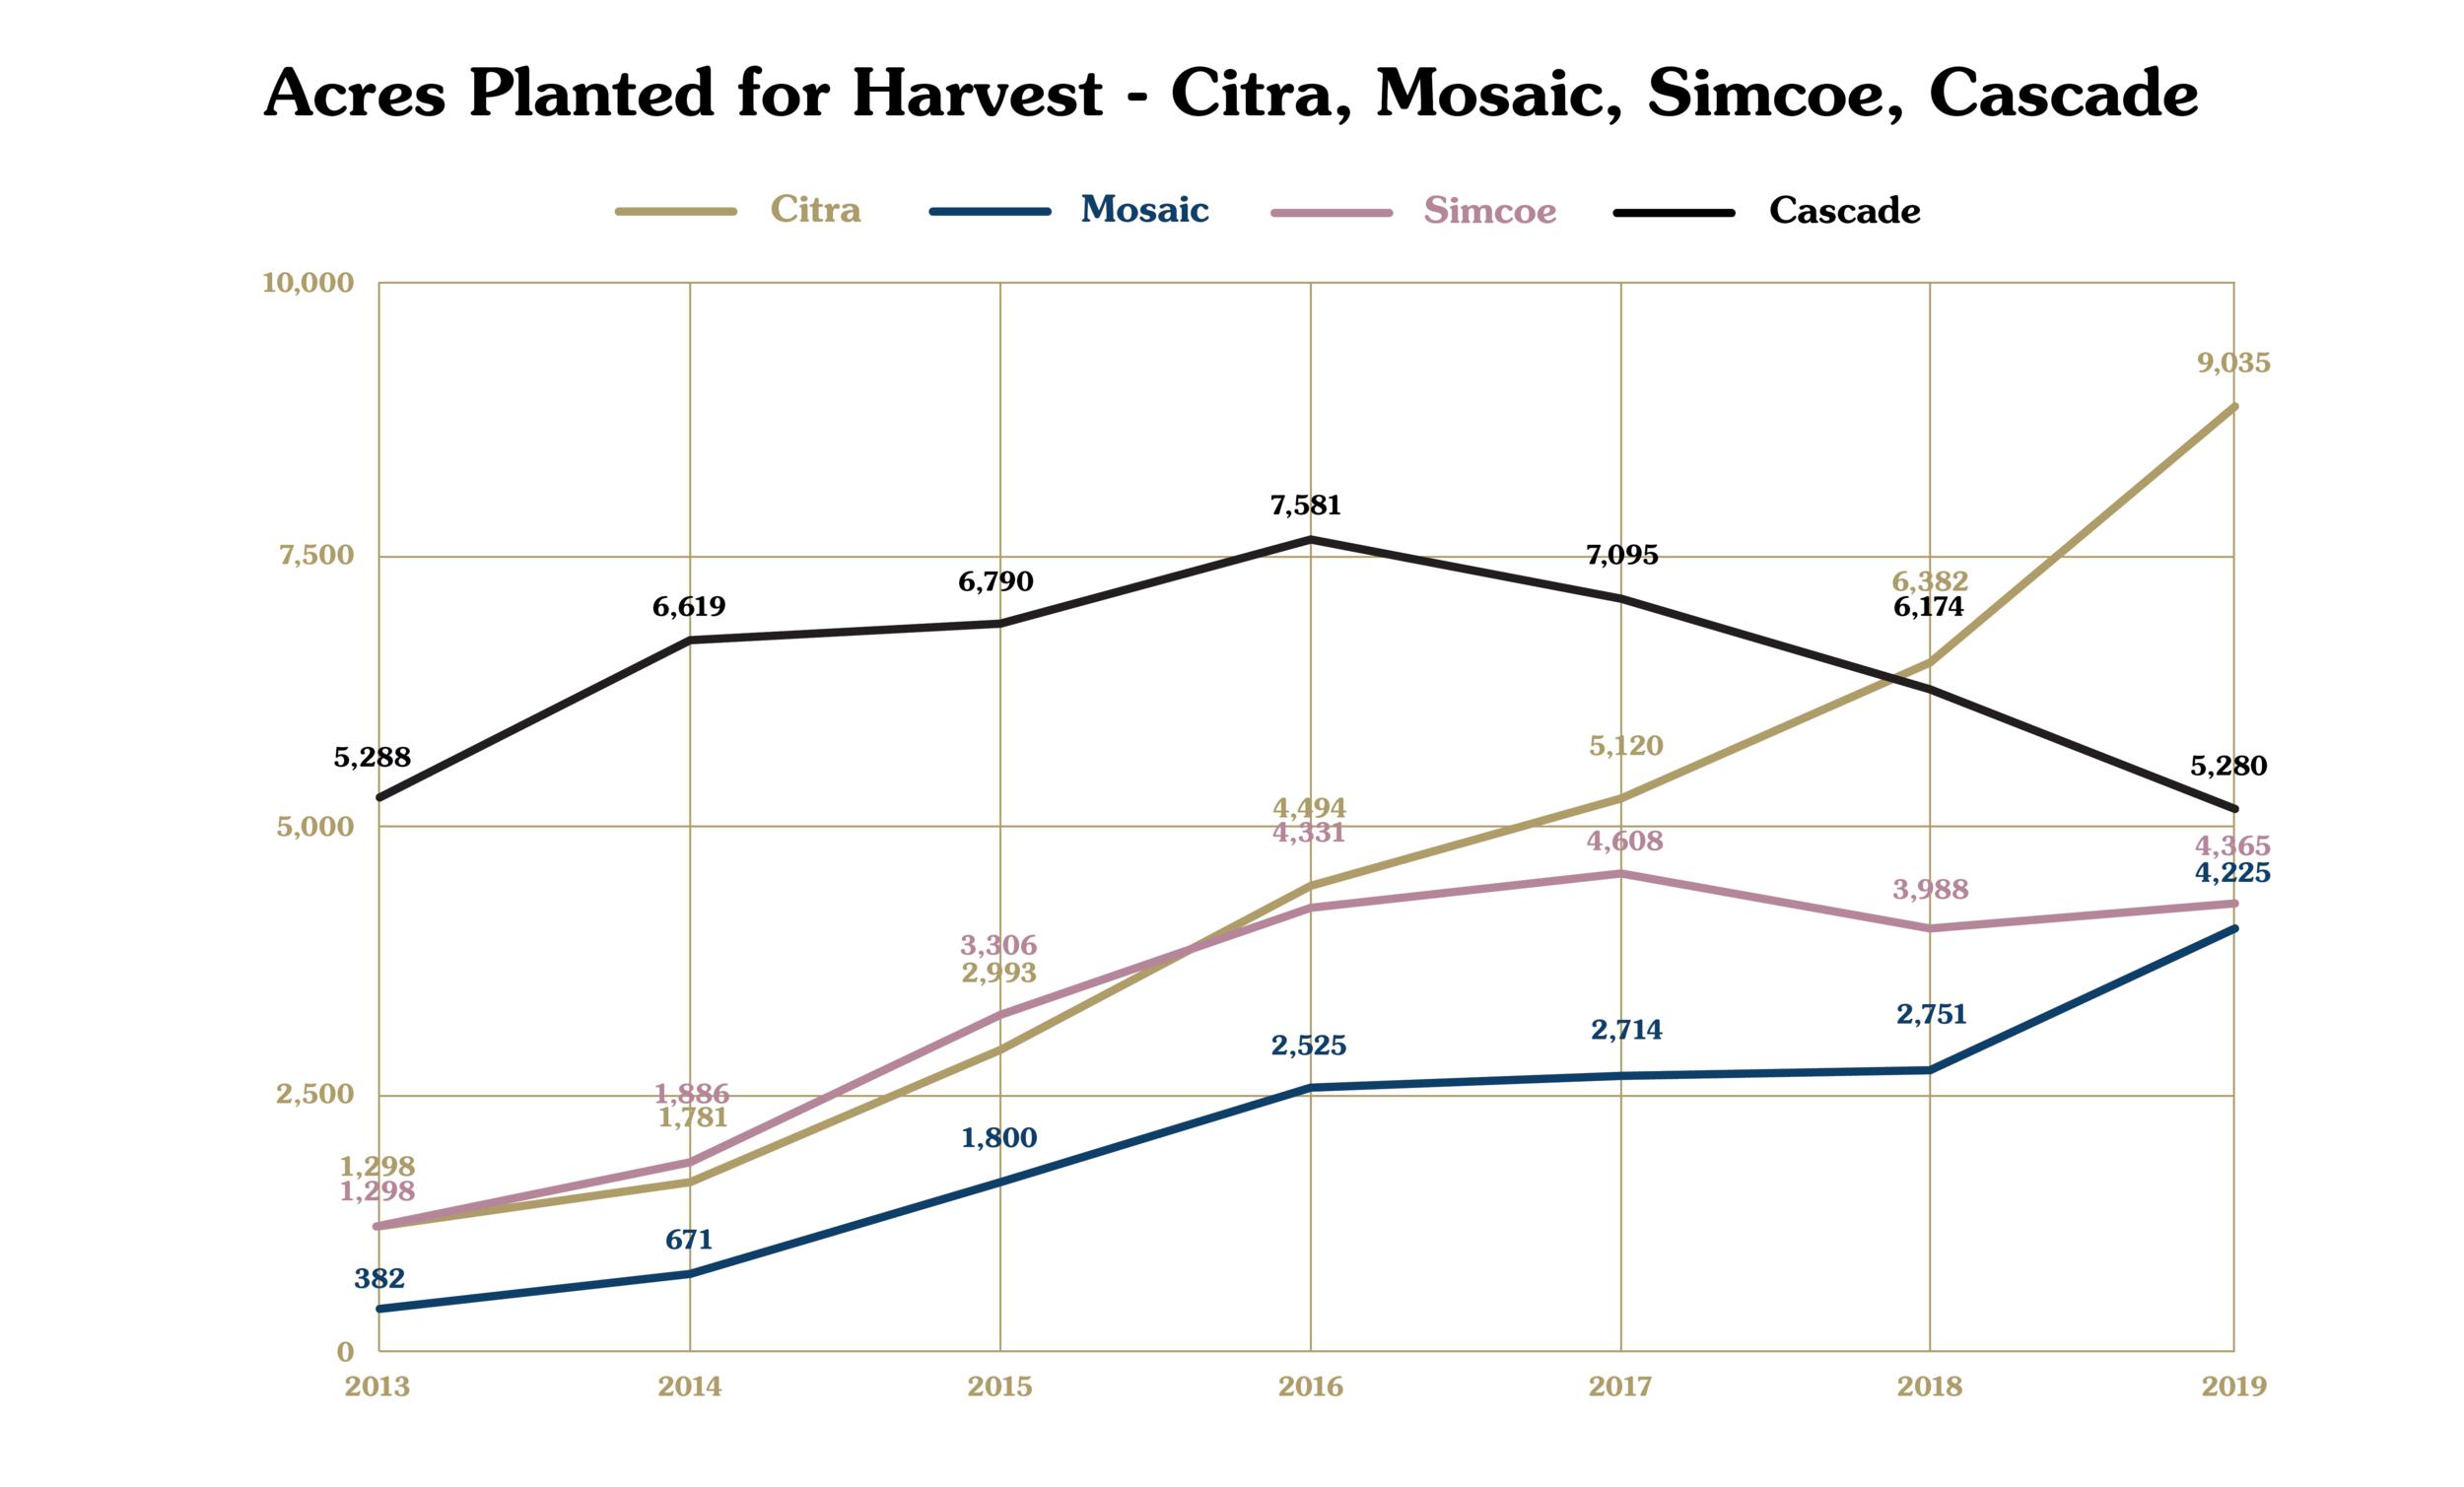 Click to enlarge [National Agricultural Statistics Service]